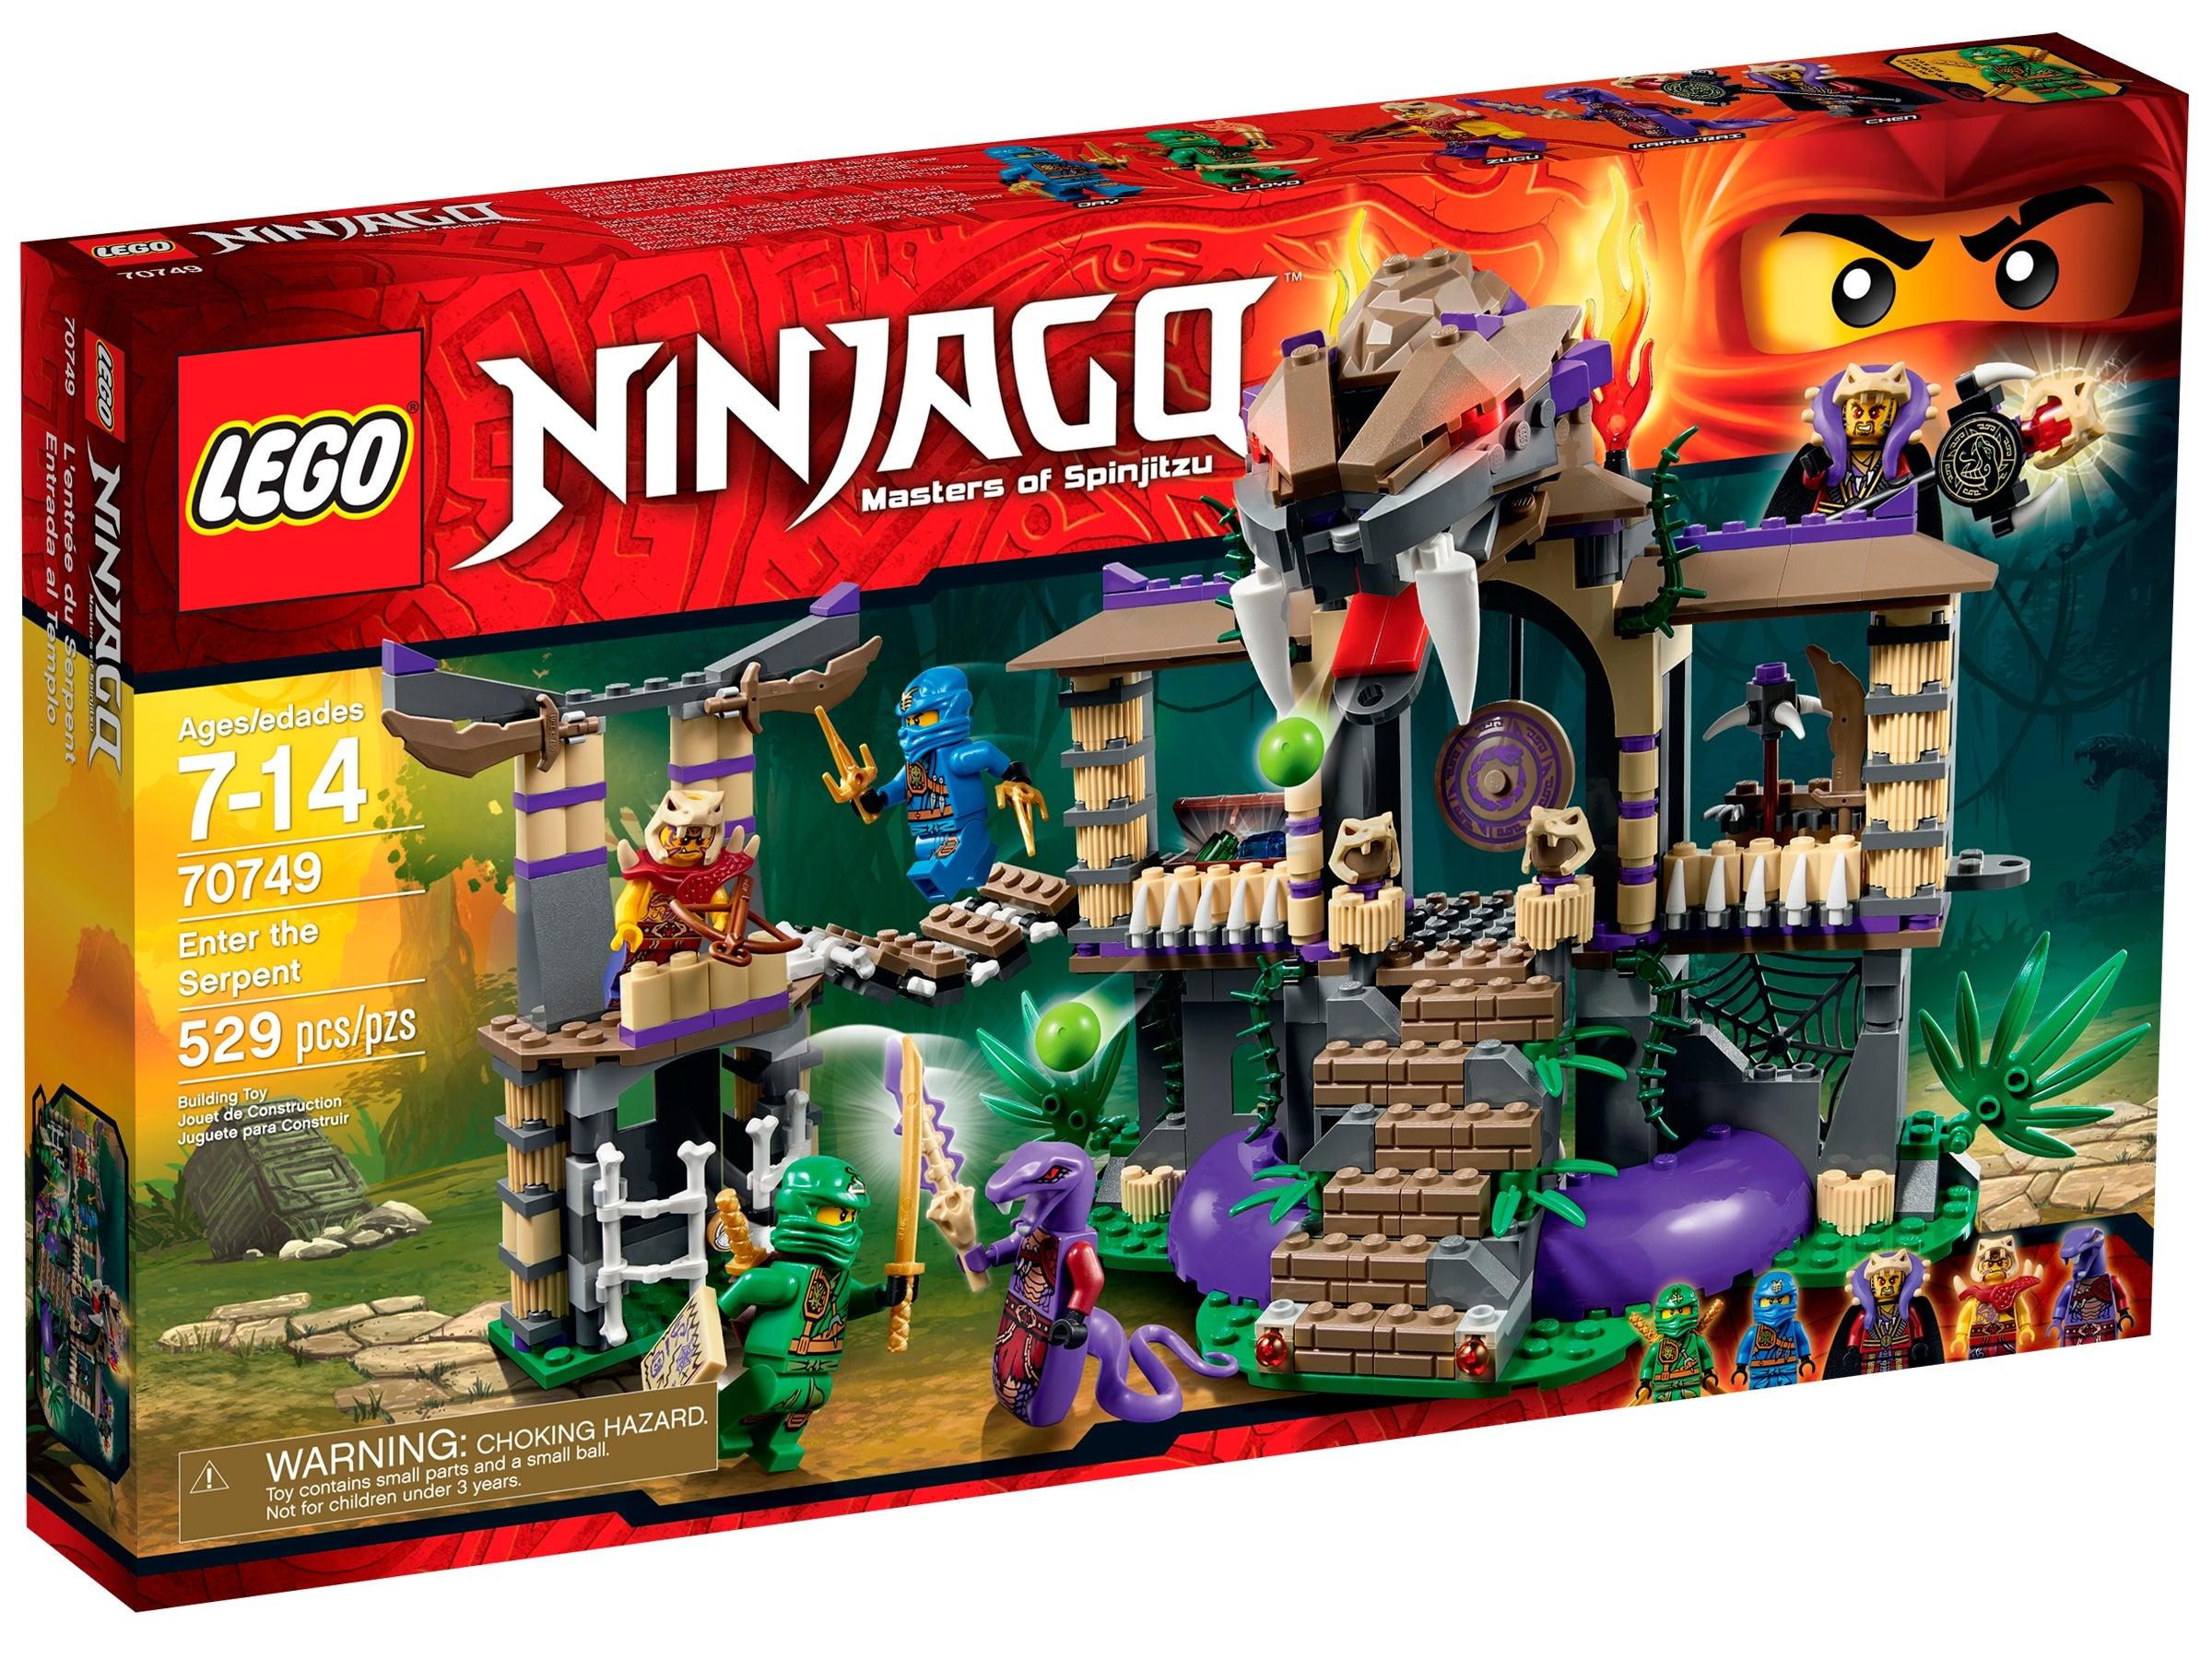 NINJAGO 70749 Set Braind New Ninjago Season 4